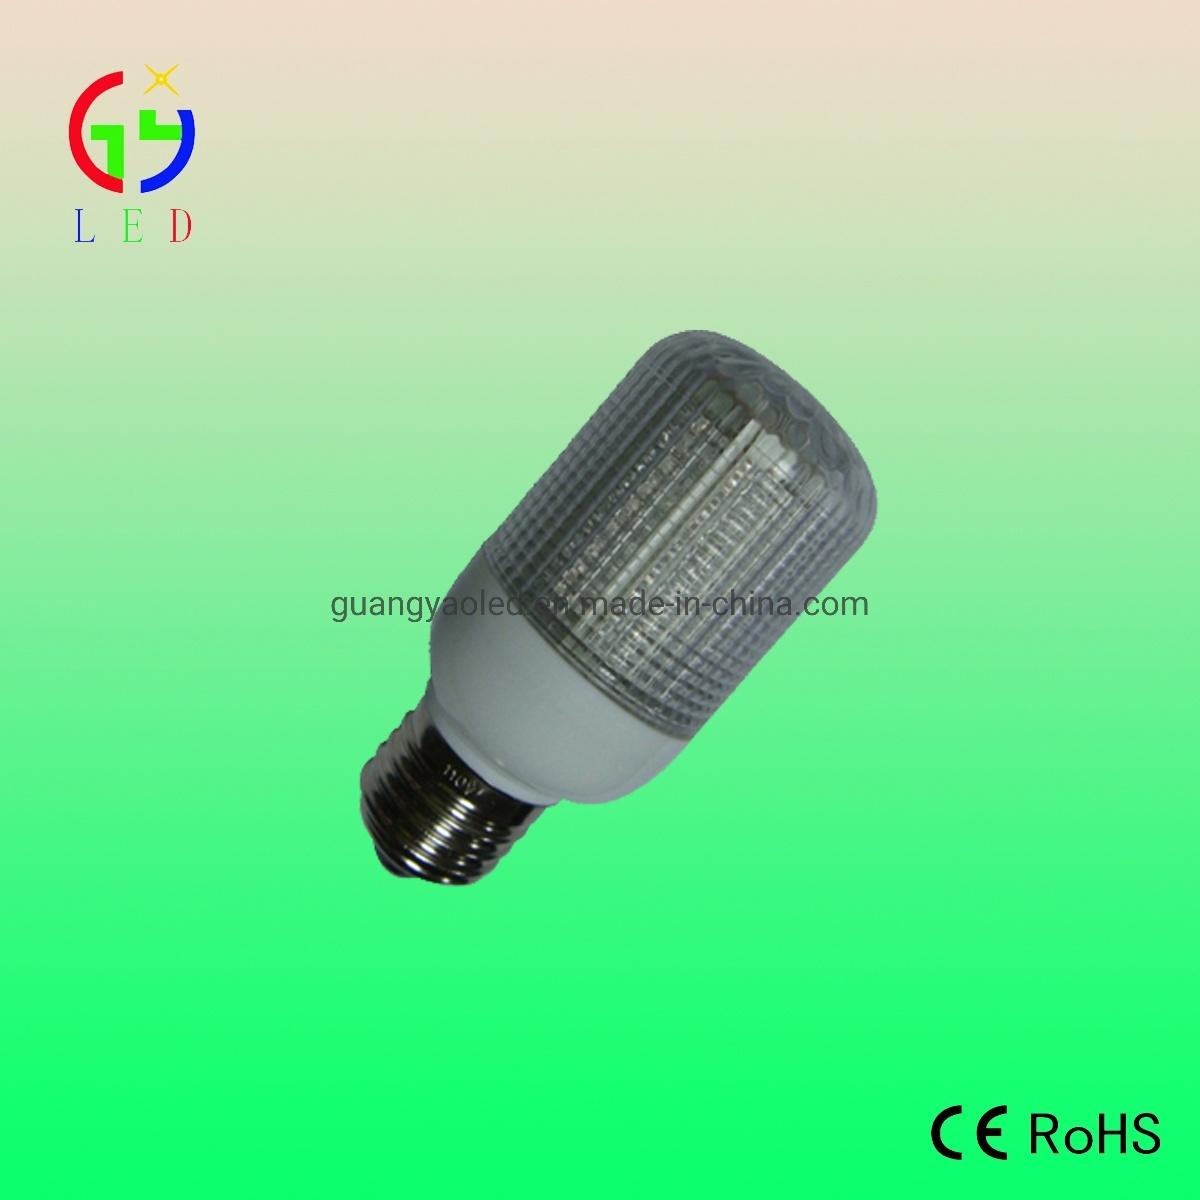 China T41 44led E27 Indoor Lamps Led Landscape Lighting Bulbs China Led Home Light Led Indoor Bulb